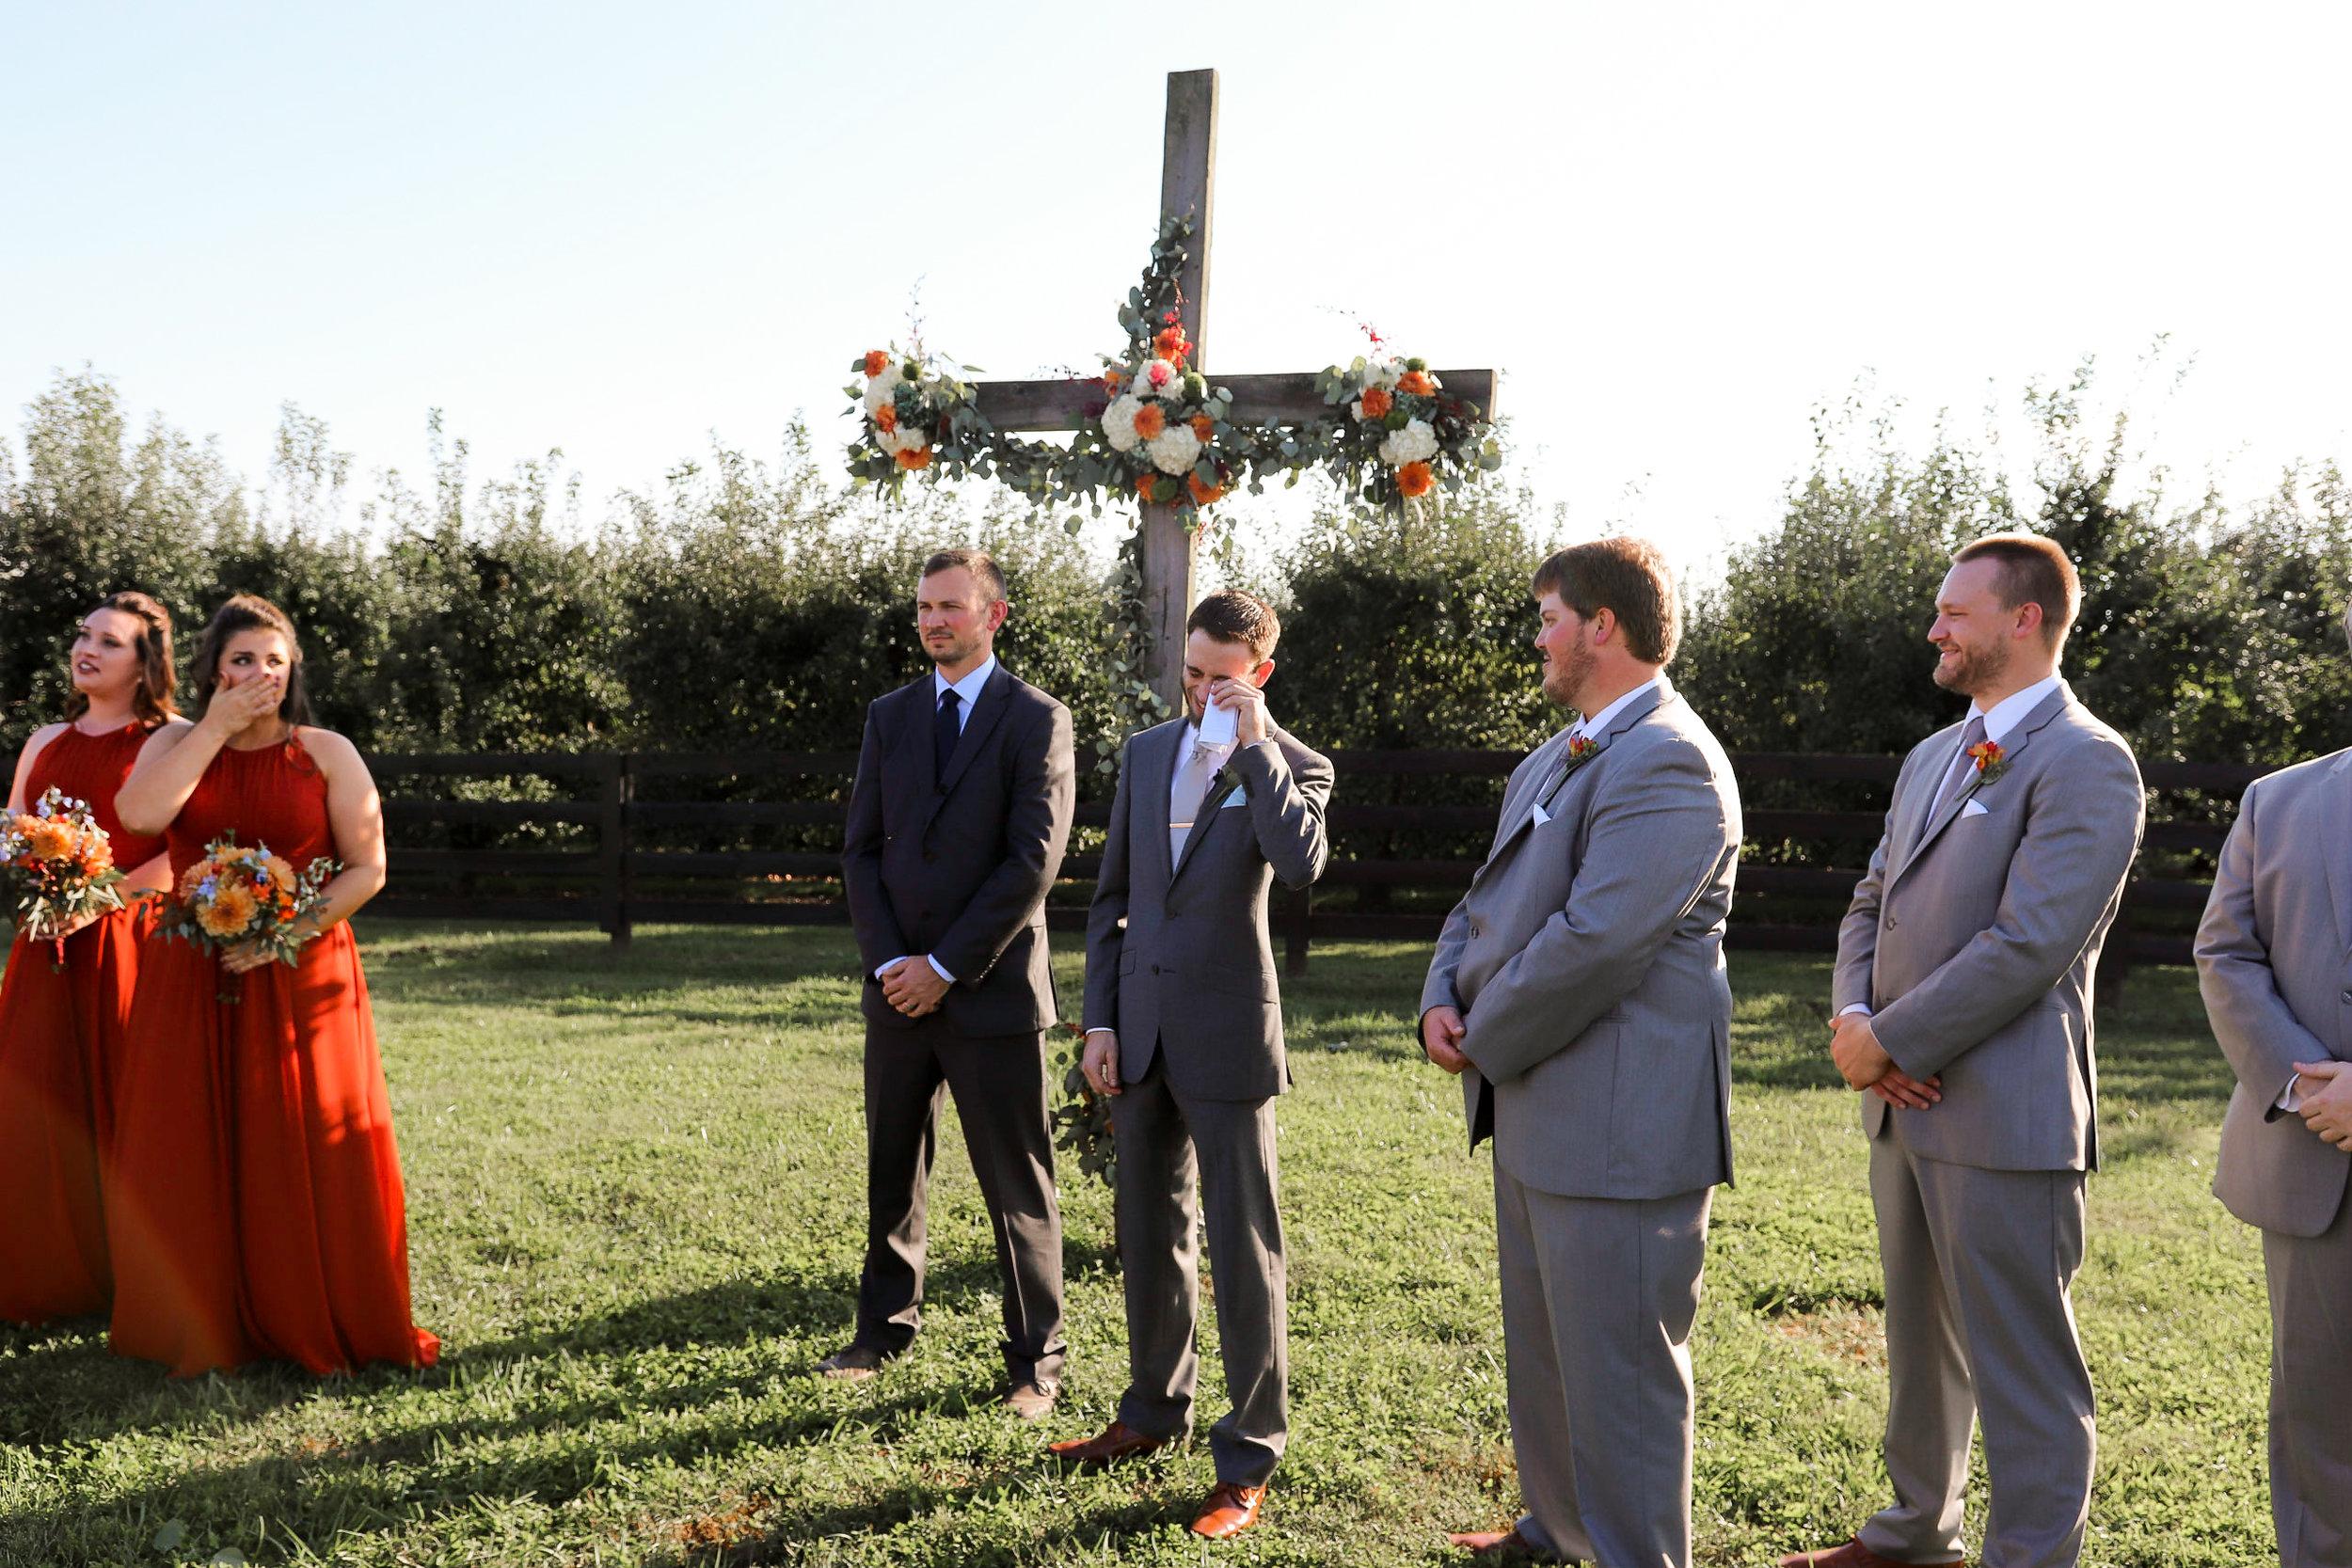 Evans-Orchard-Lexington-Kentucky-Fall-Wedding-17.jpg